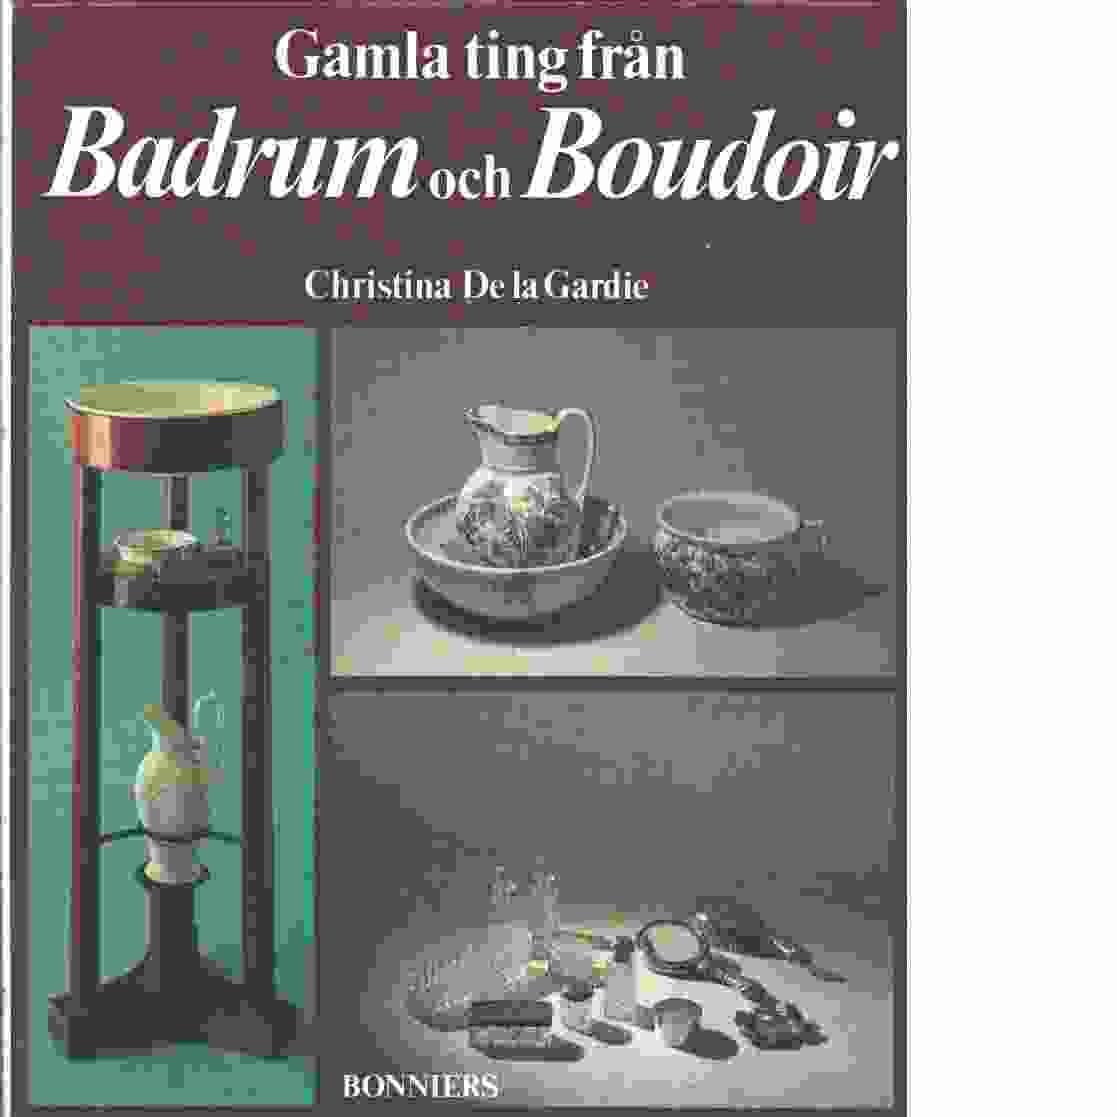 Gamla ting från badrum och boudoir - De la Gardie, Christina